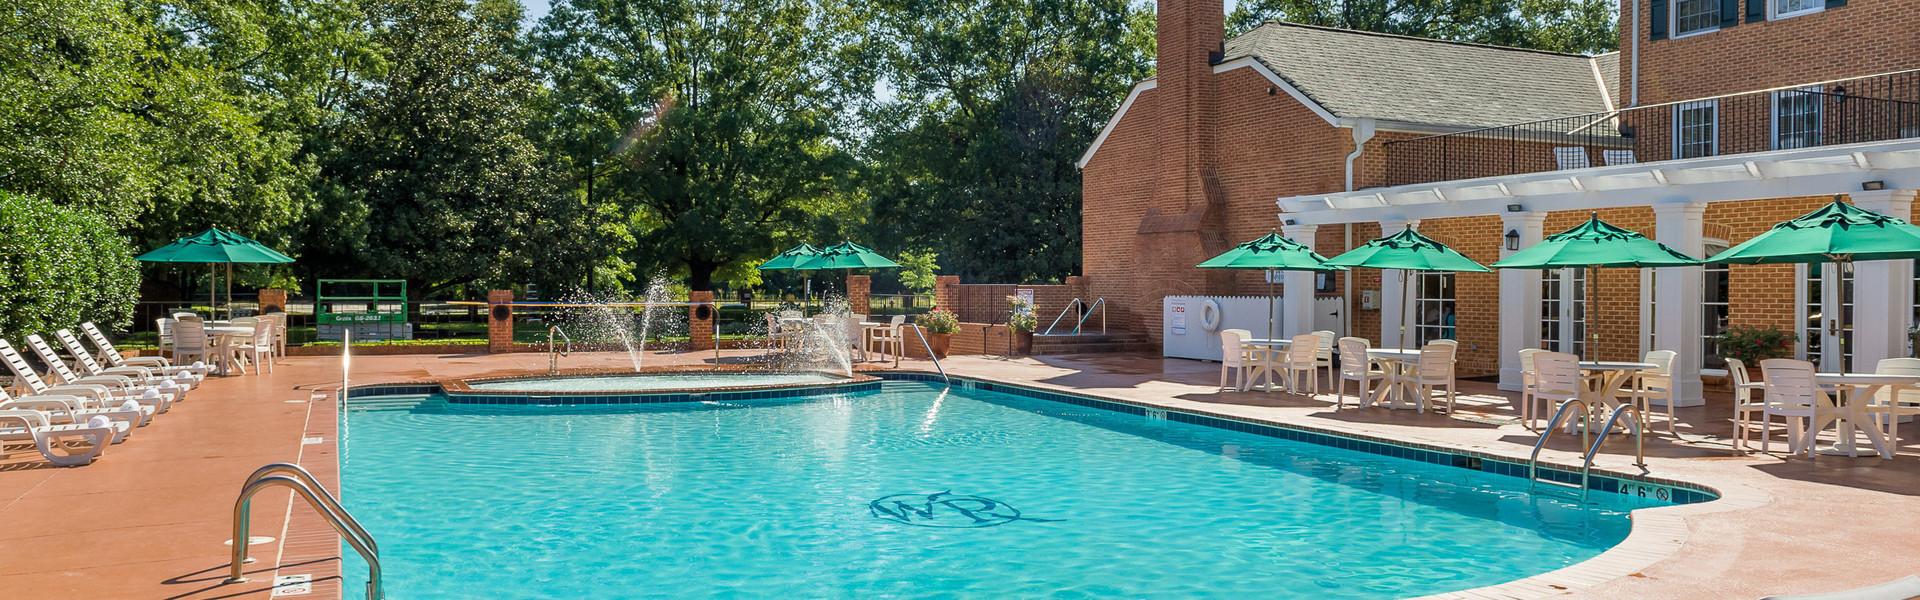 Hotels with Pools in Williamsburg Virginia | Westgate Historic Williamsburg Resort